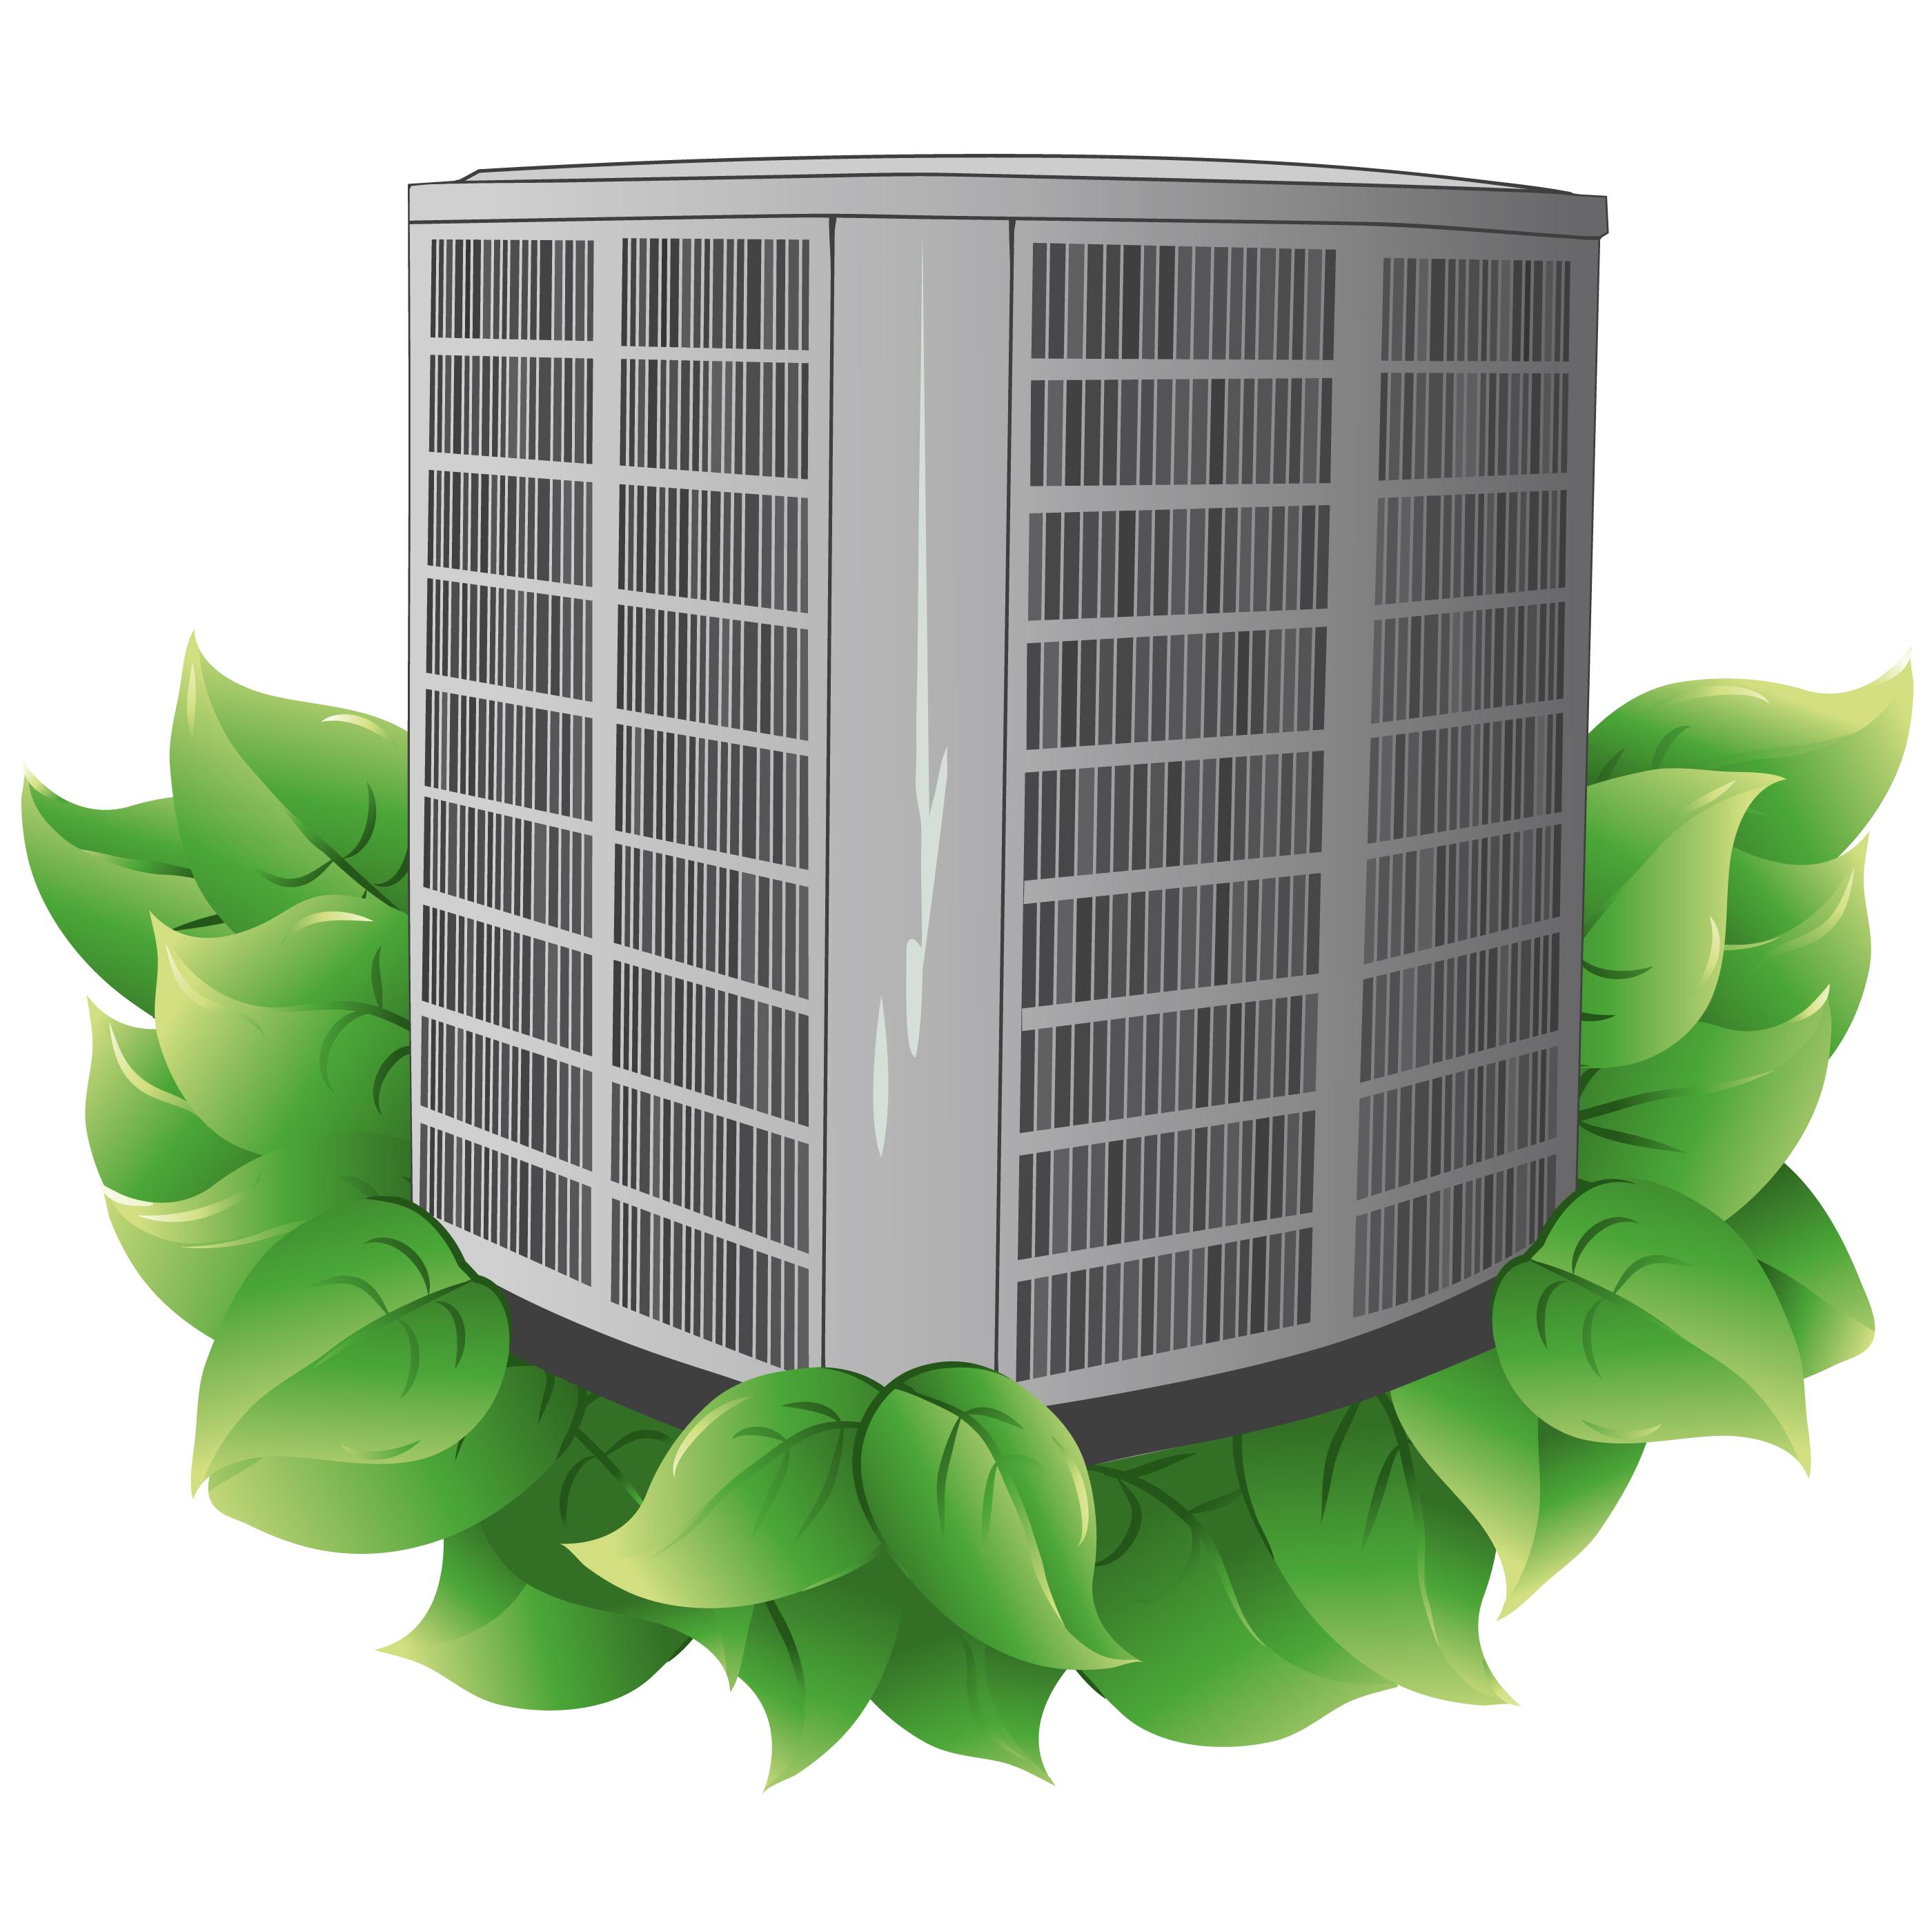 Free HVAC Unit Cliparts, Download Free Clip Art, Free Clip.